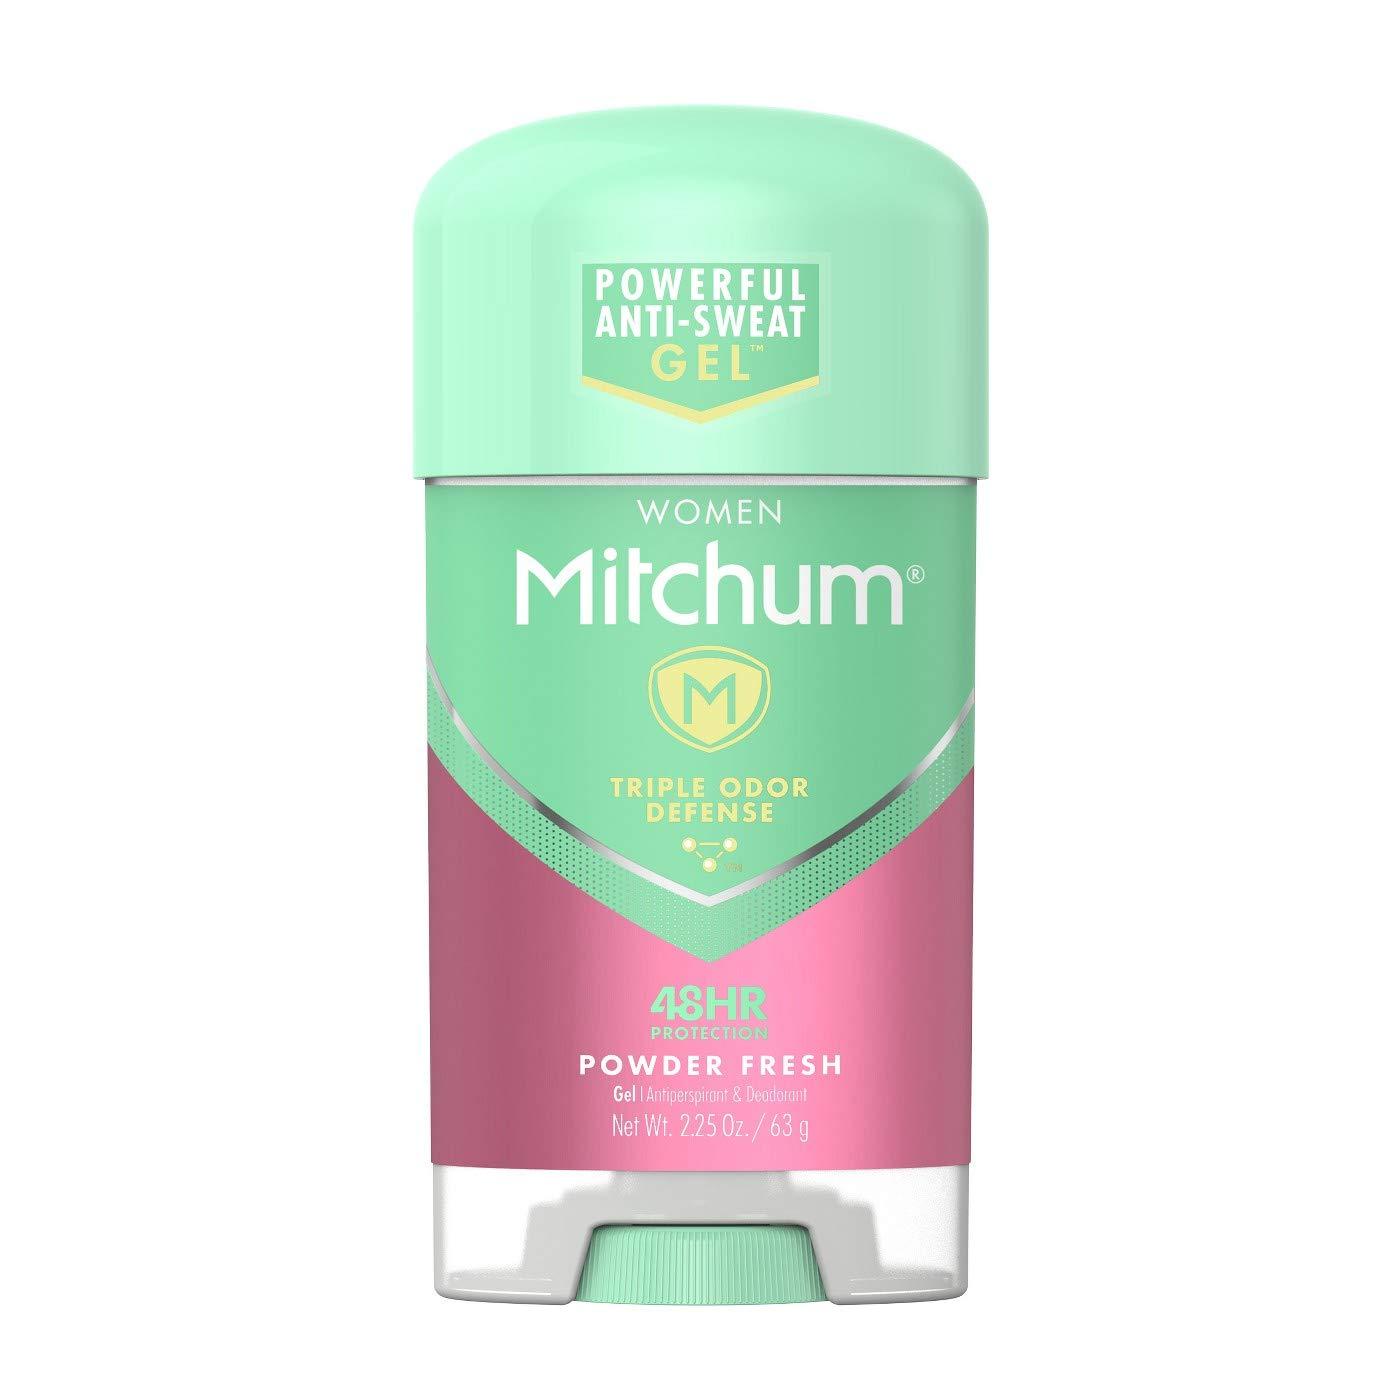 Mitchum For Women Power Gel Anti-Perspirant Deodorant Powder Fresh 2.25 oz (Pack of 4)